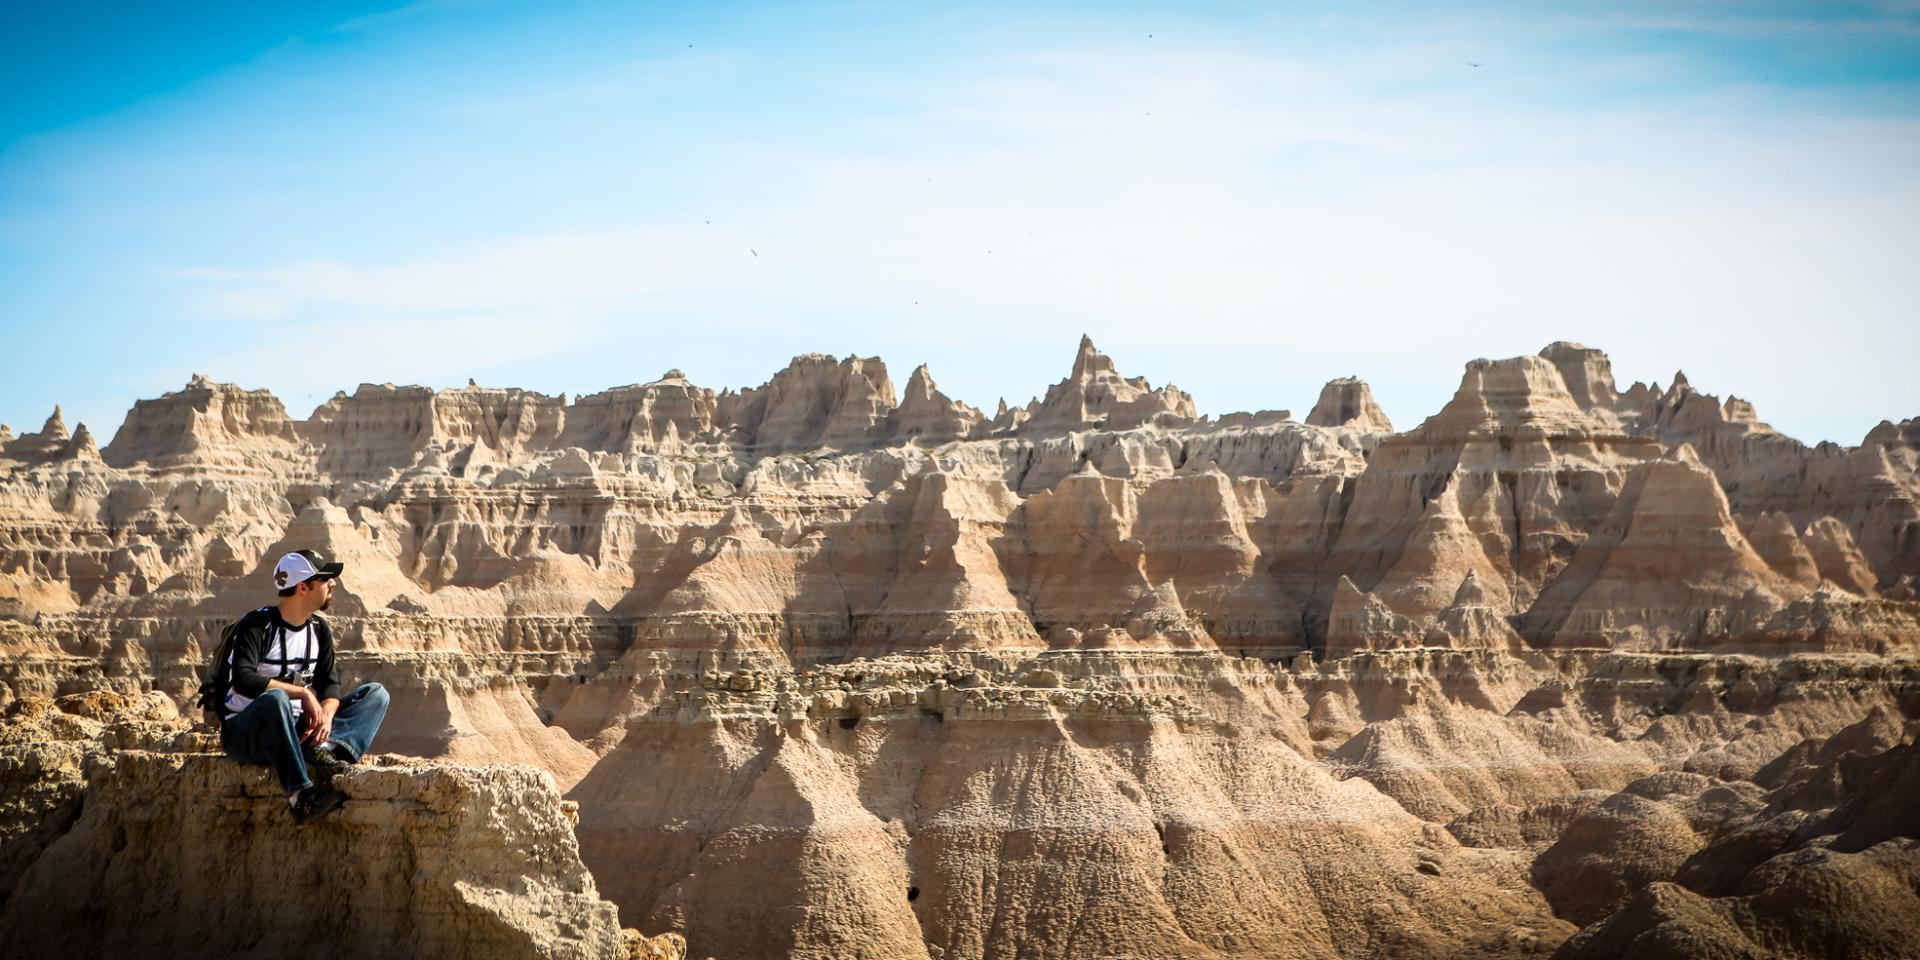 Badlands National Park | Photo by: Shawna Valladolid